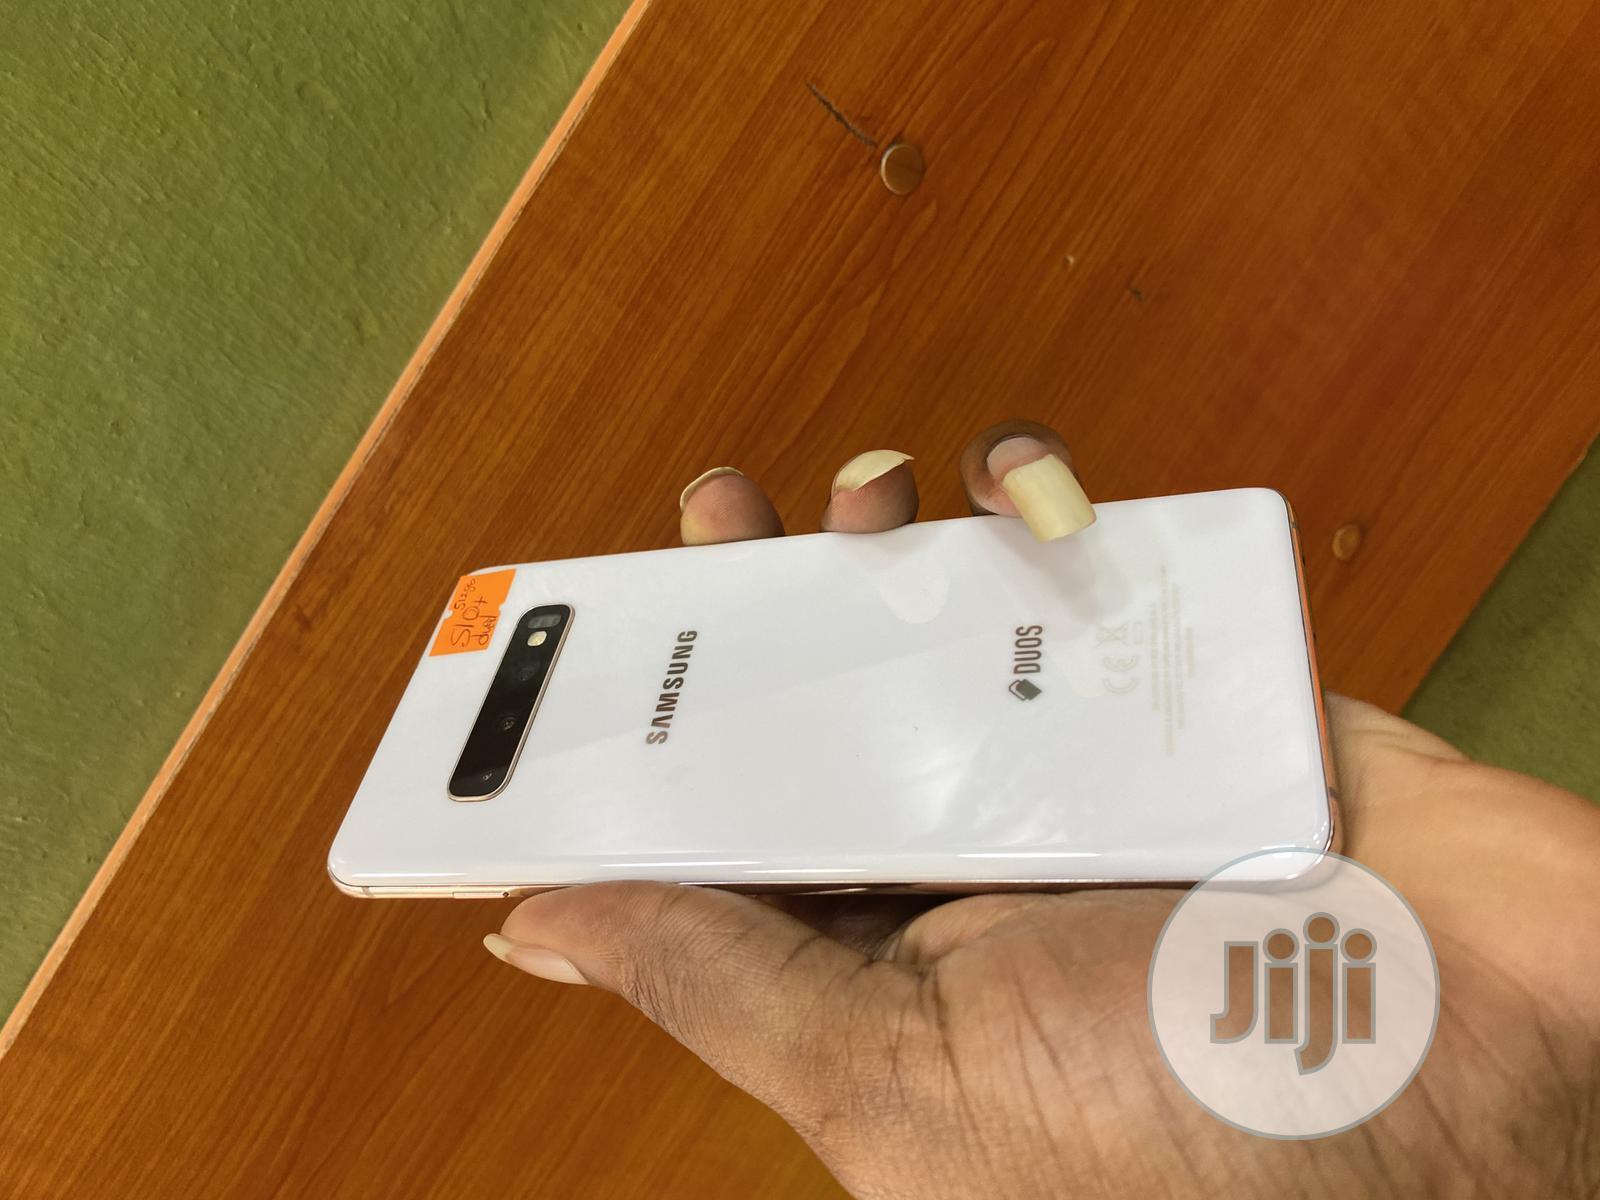 Samsung Galaxy S10 Plus 512 GB White | Mobile Phones for sale in Ikeja, Lagos State, Nigeria